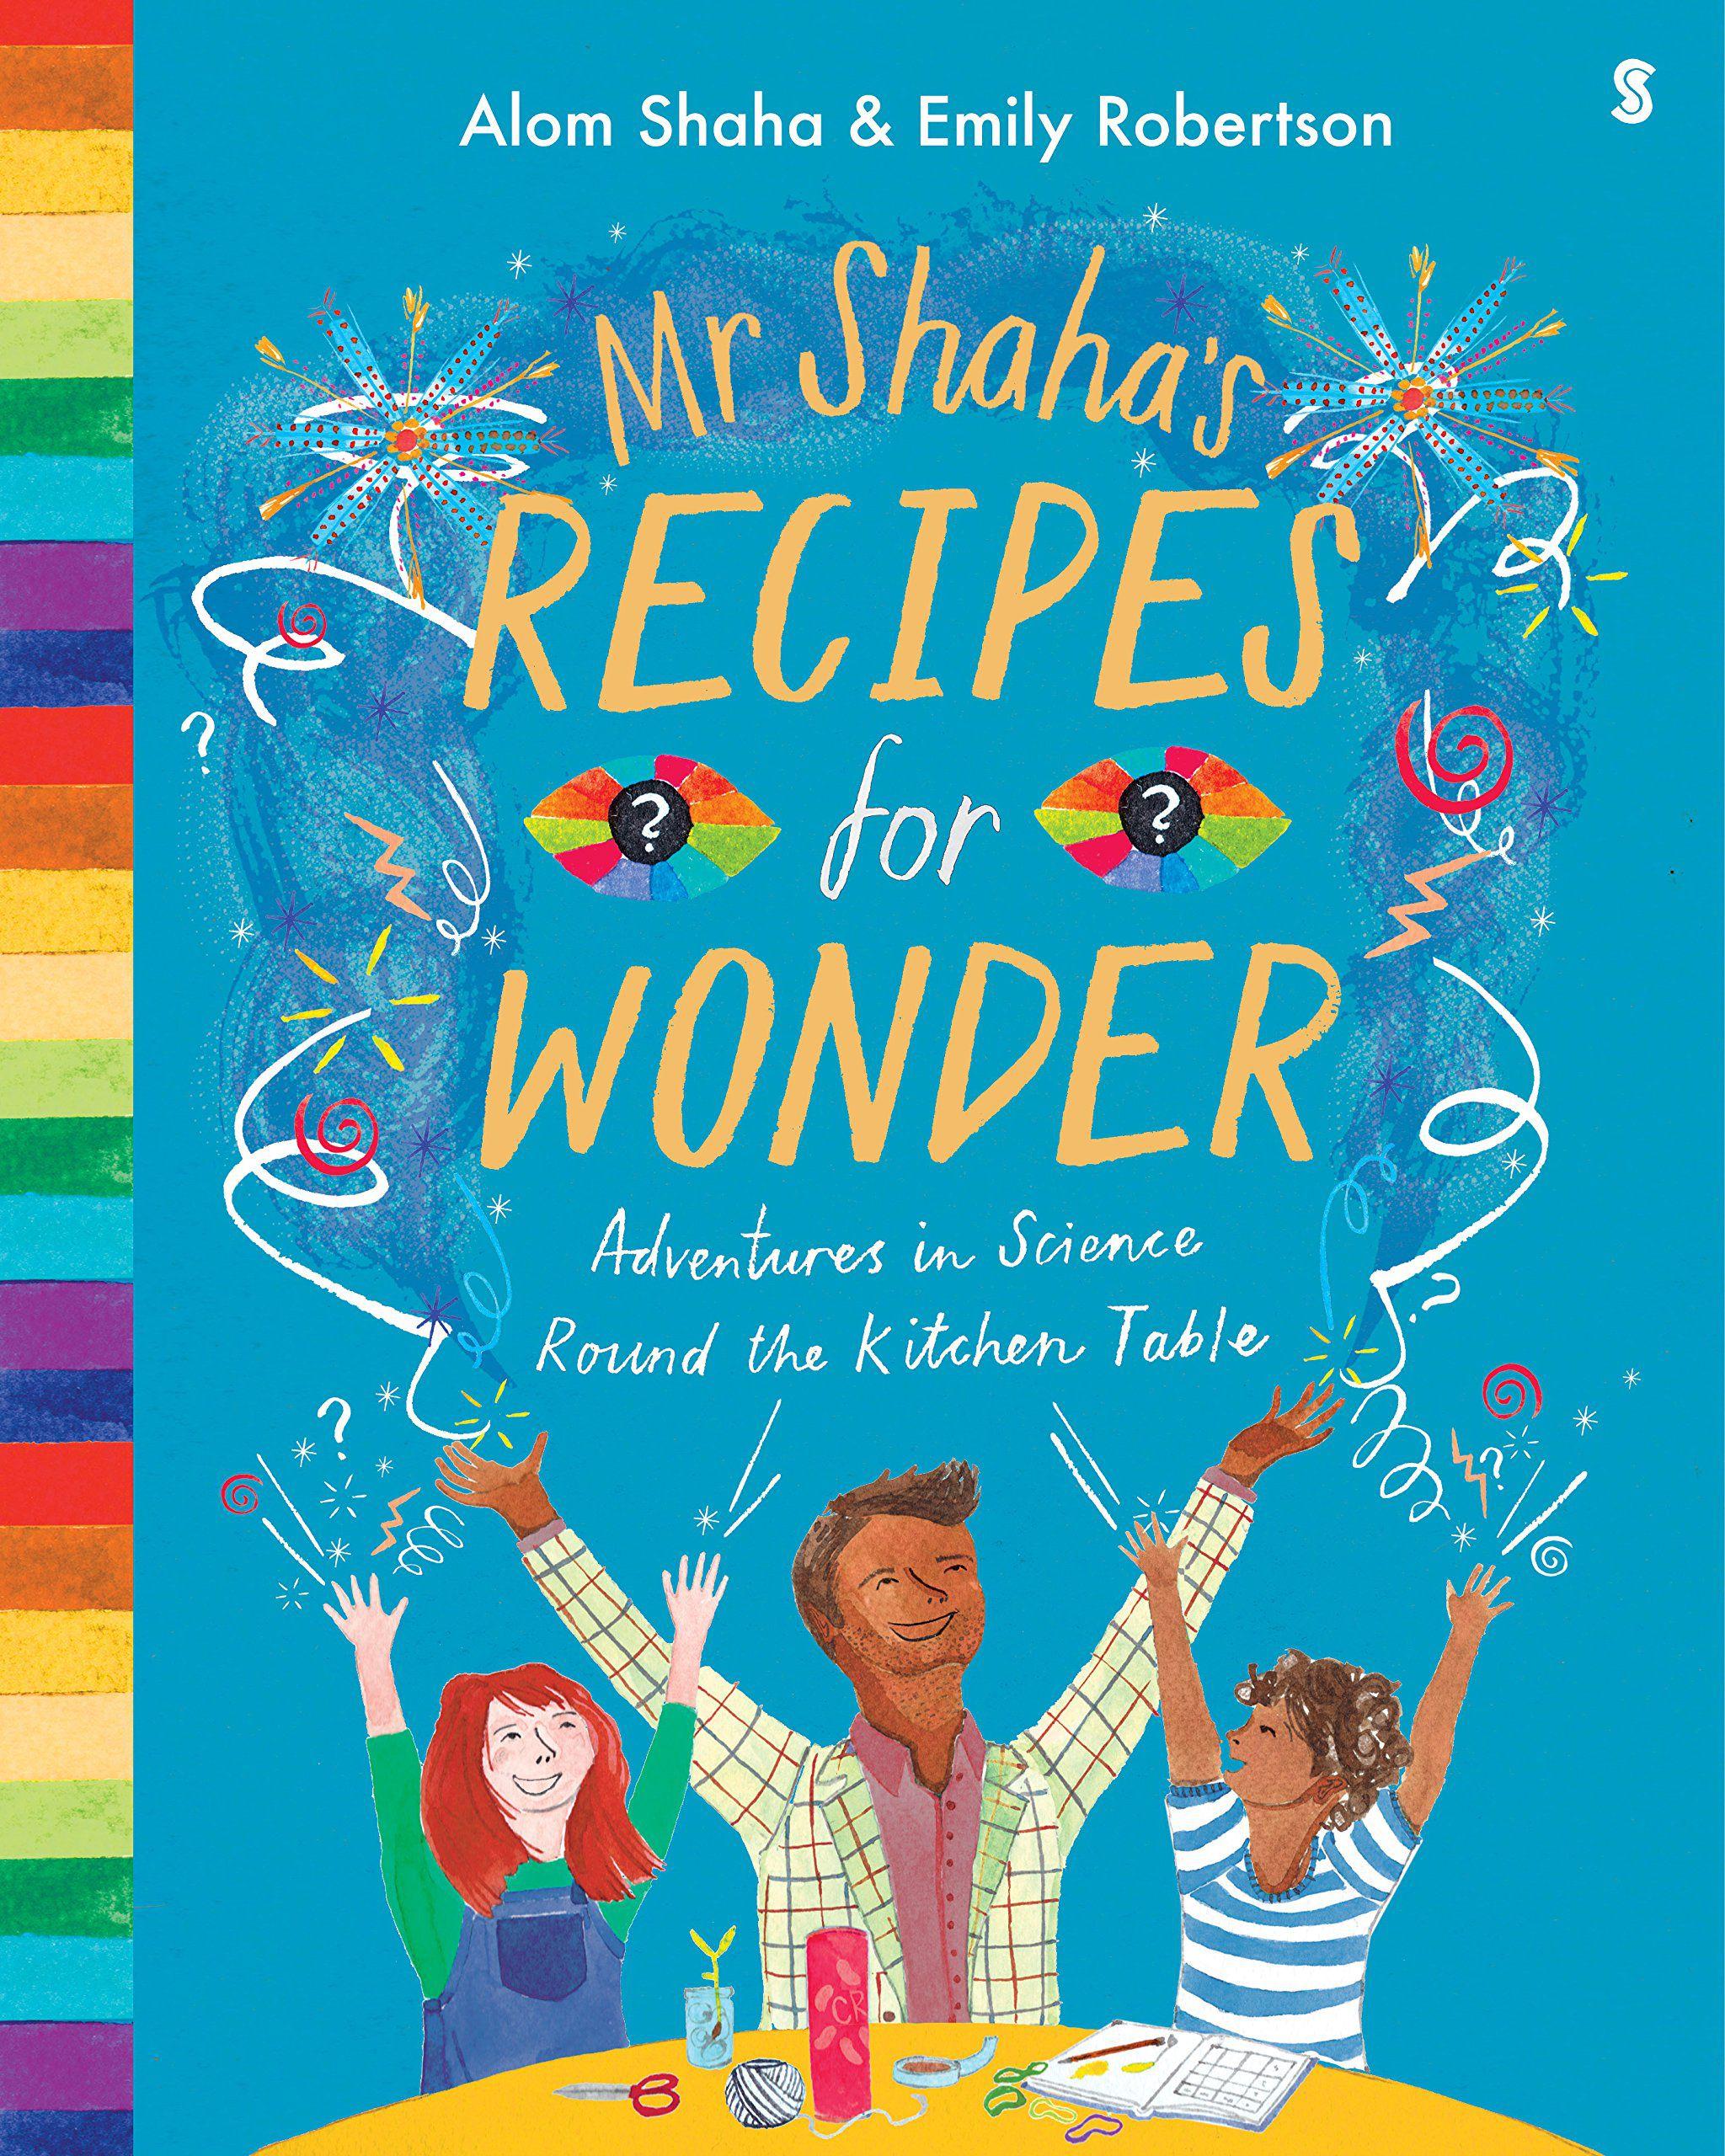 Mr. Shaha's Recipes for Wonder